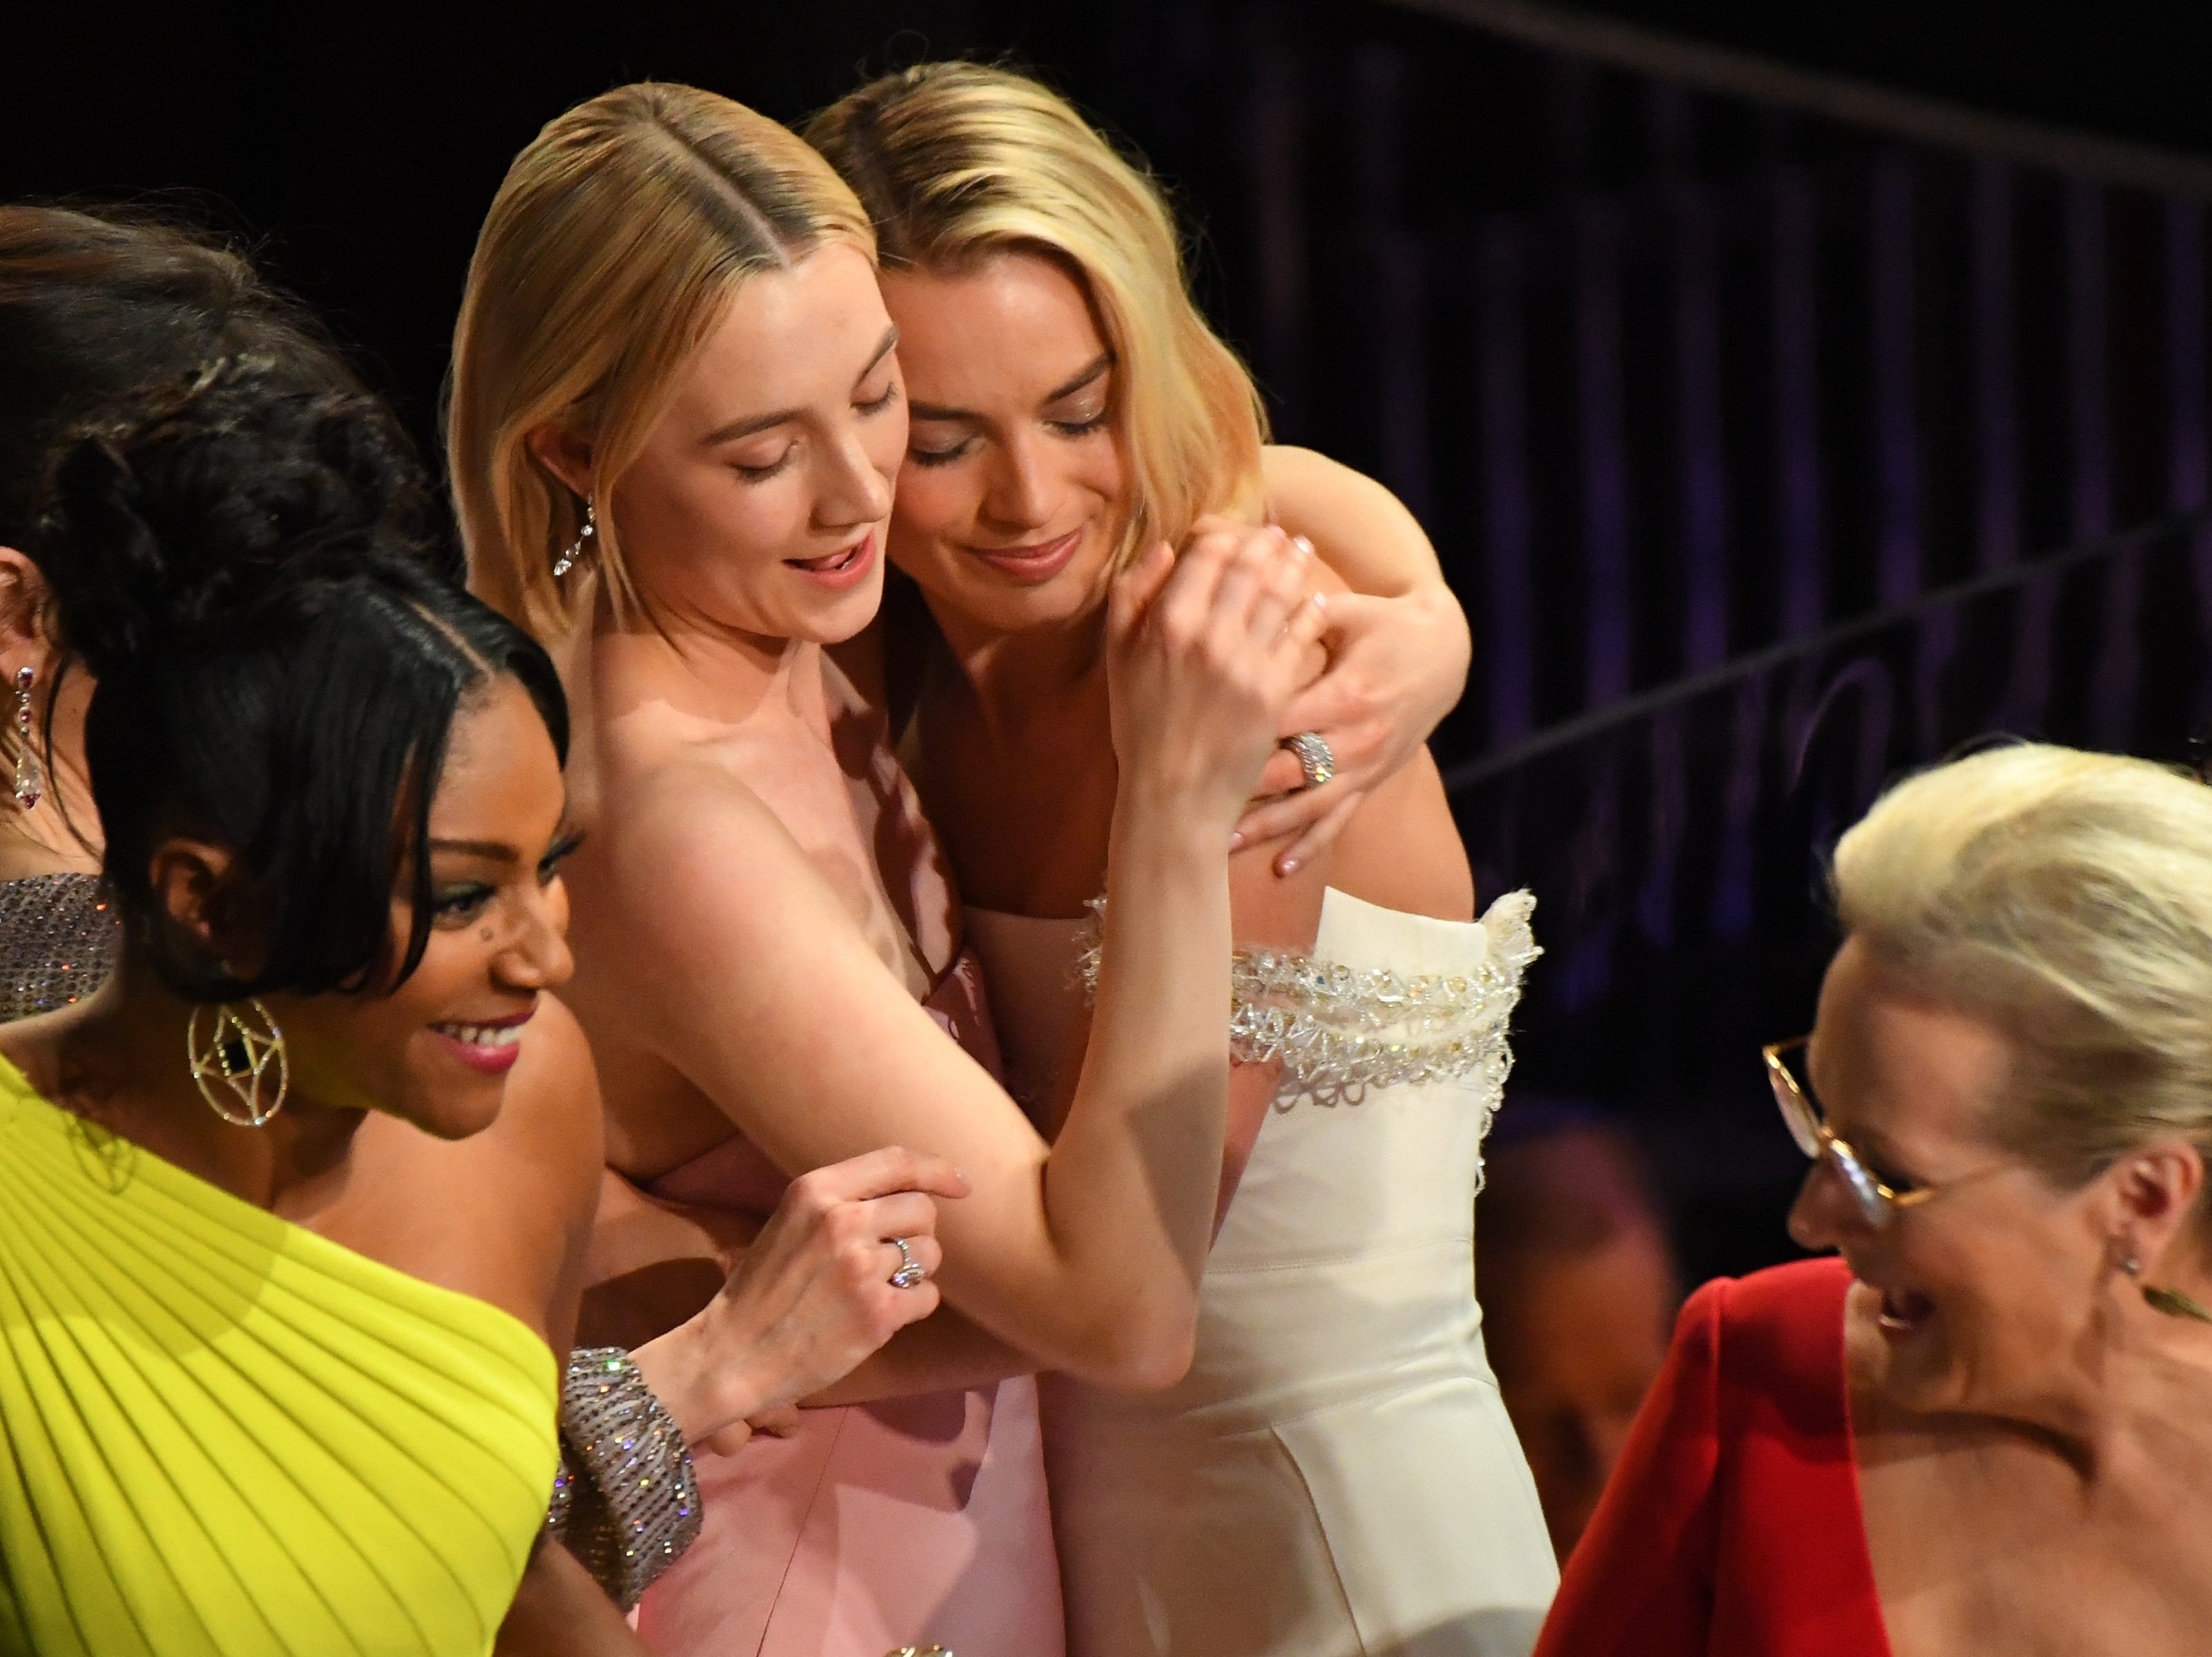 March 4: Saoirse Ronan and Margot Robbie hug at the Oscars.